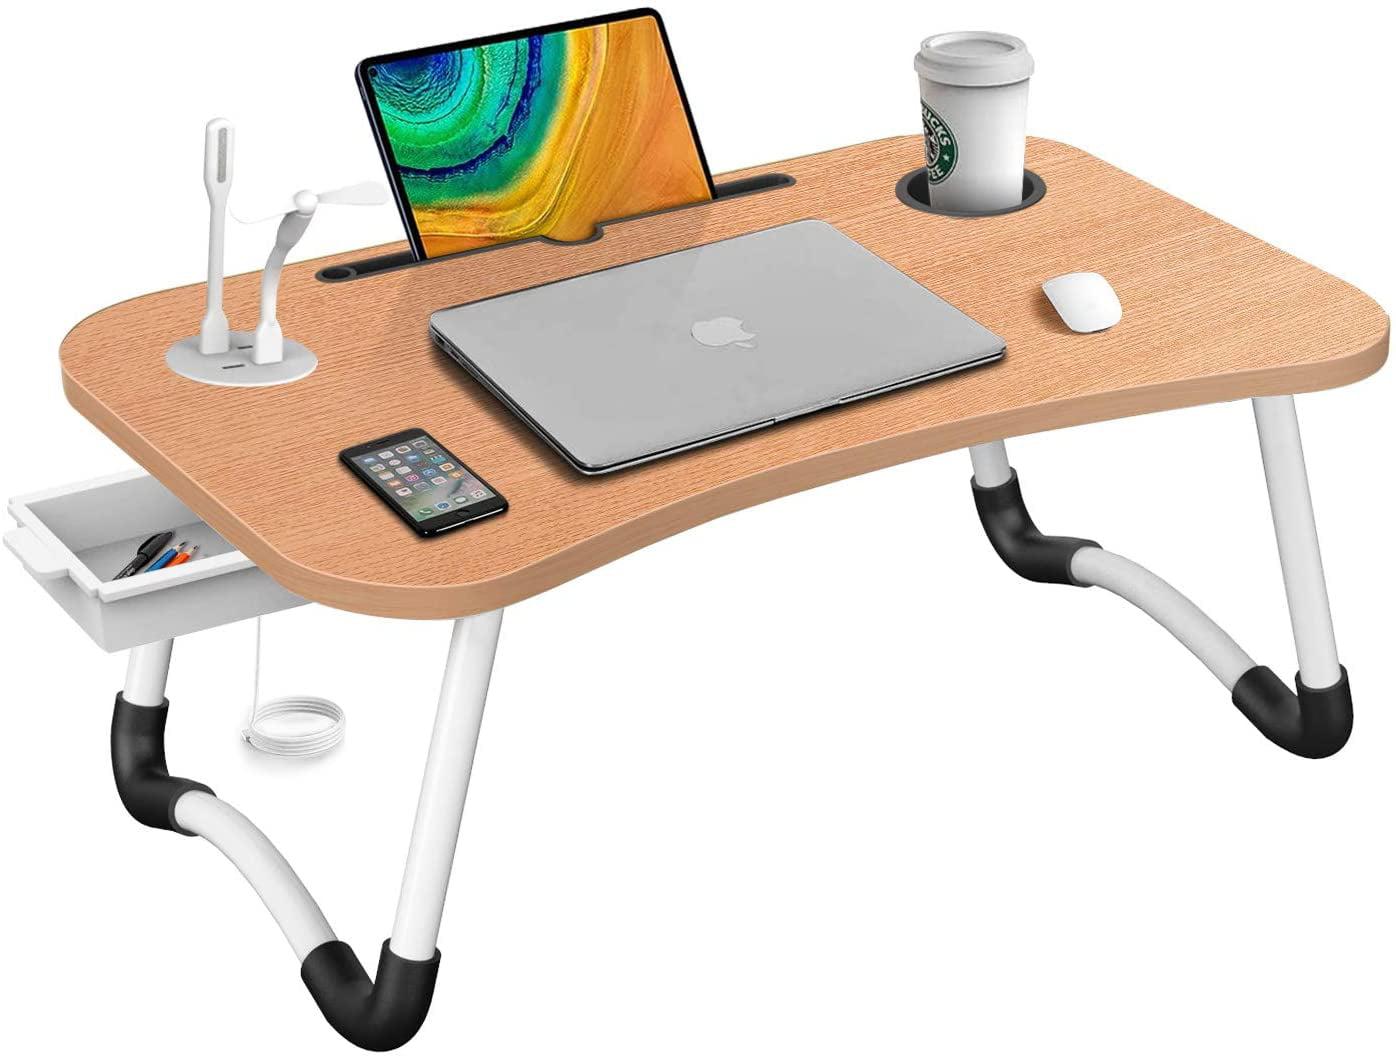 Hlhome Laptop Bed Desk Portable, Portable Folding Desk Pc Laptop Bed Table